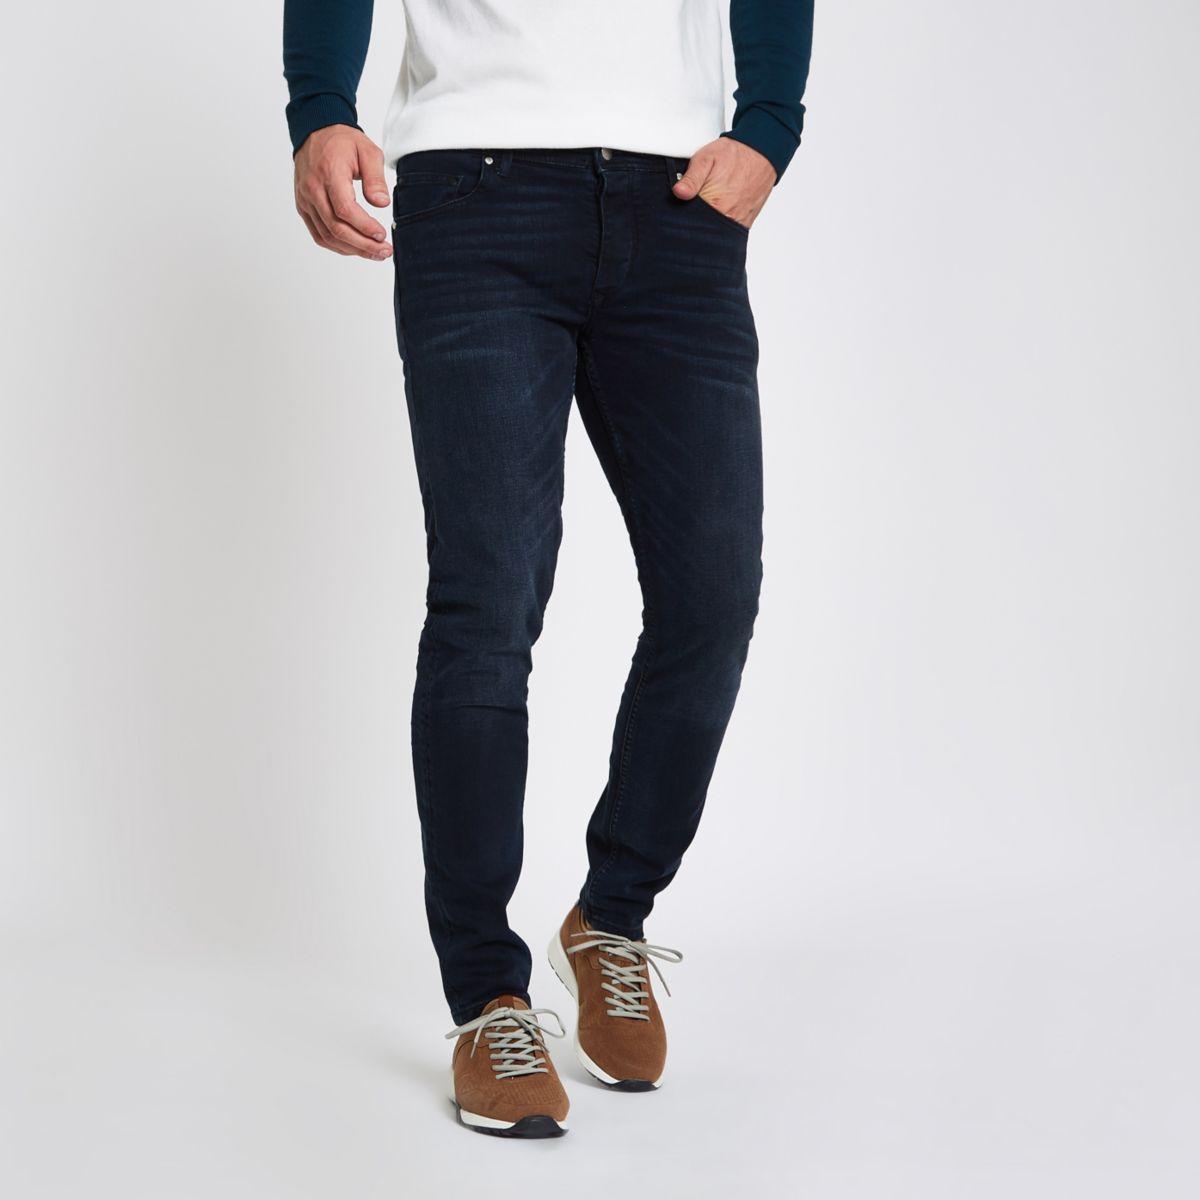 Dark blue skinny fit denim jeans